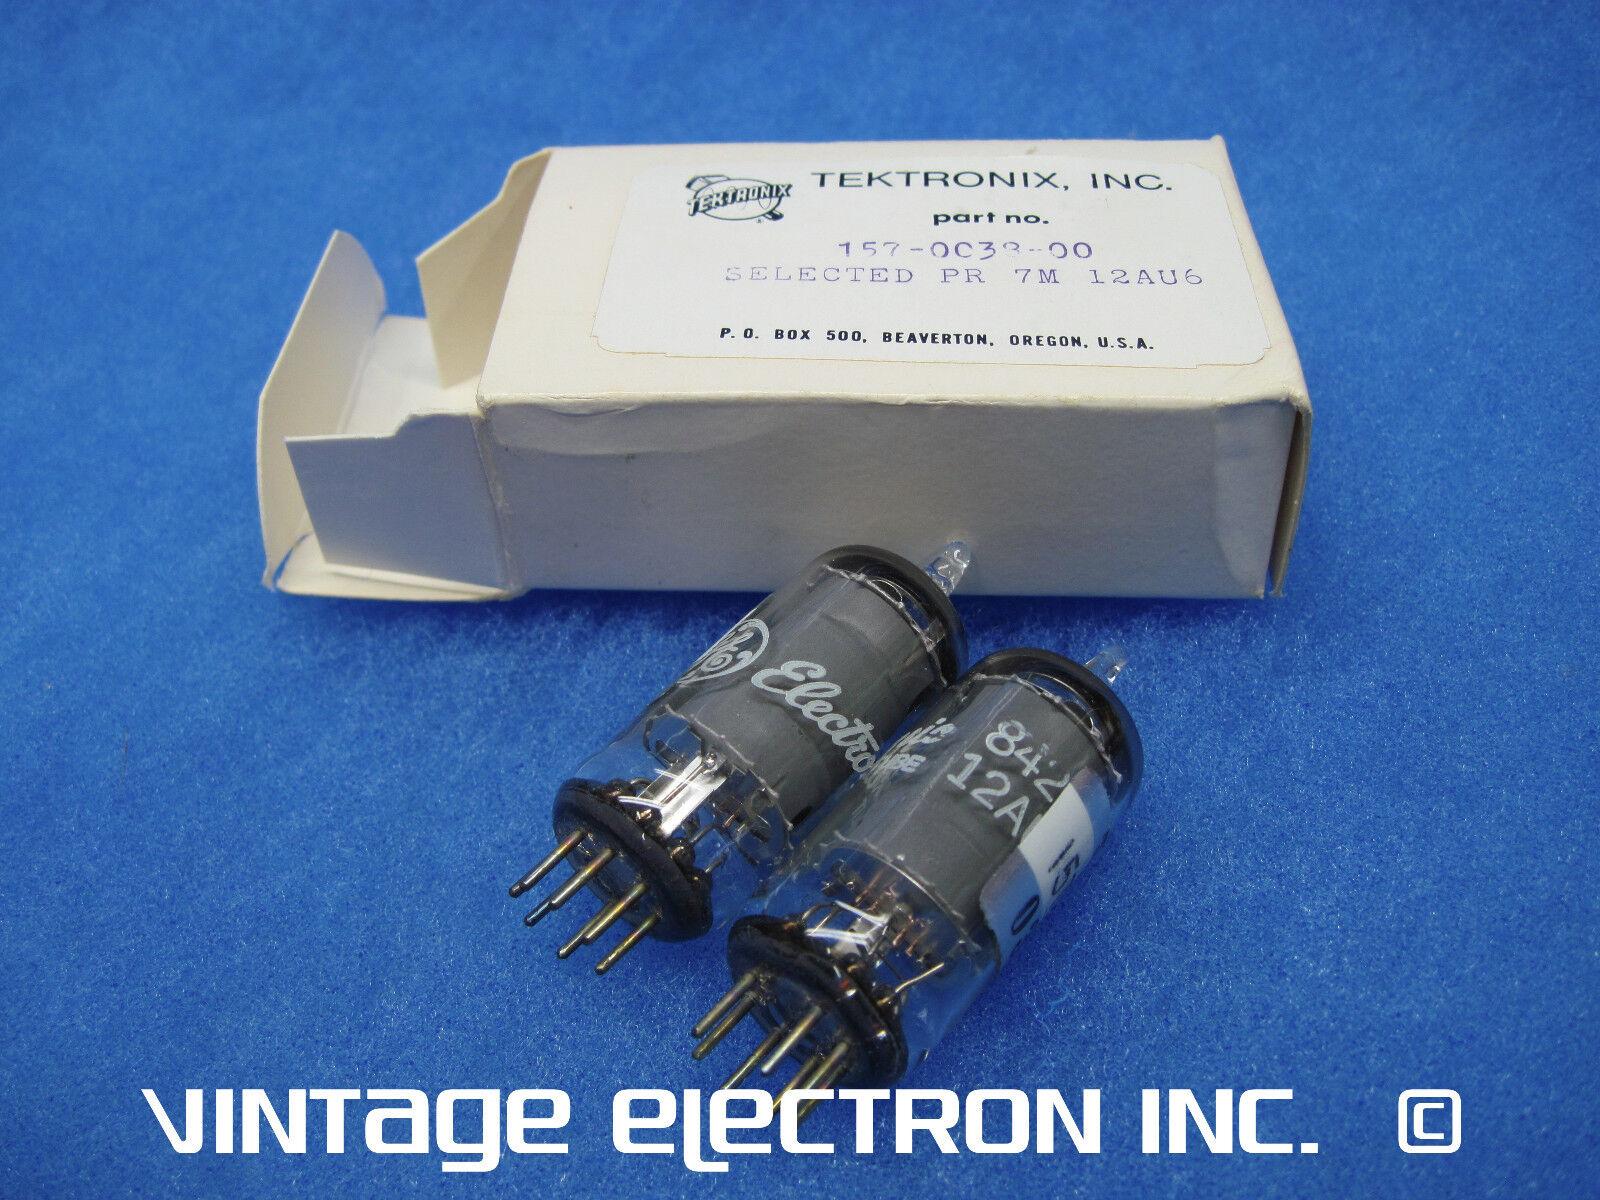 1pcs  NUVISTOR  Electronic Tube 157-0107-00    8393 RCA TEKTRONIX